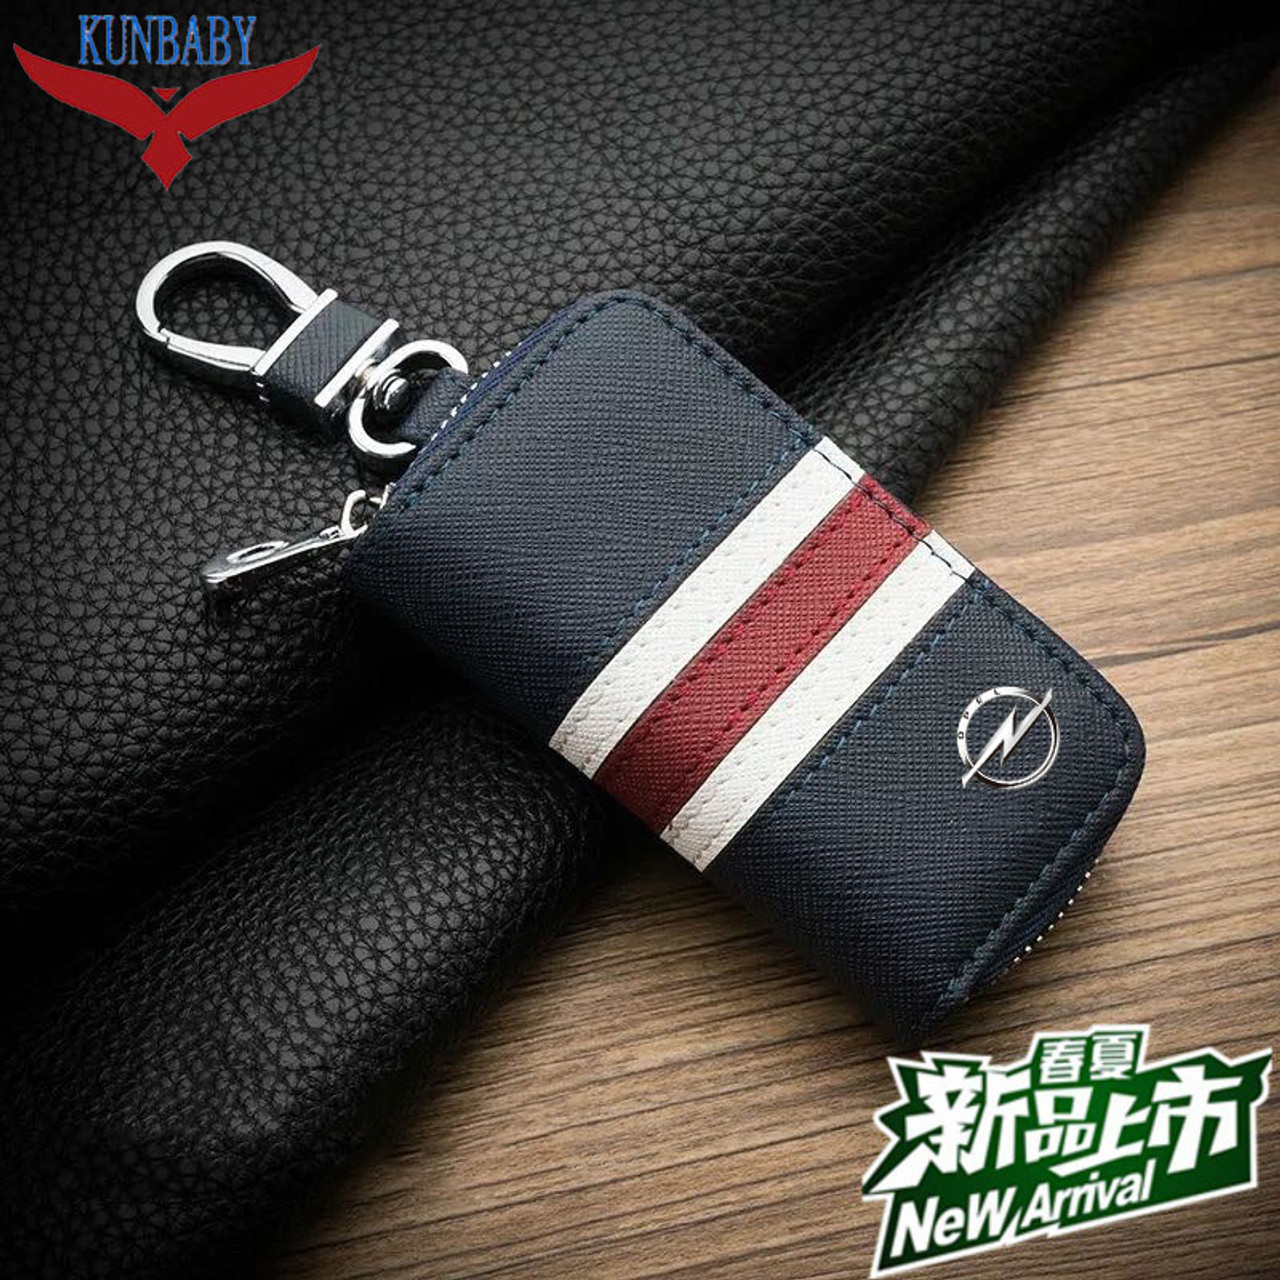 KUNBABY Top Men Women s New Fashion Car Keys Bag Keys Chains Case Holder  Cowhide Leather Key Wallet For Opel - OnshopDeals.Com 6b0aa7cabd